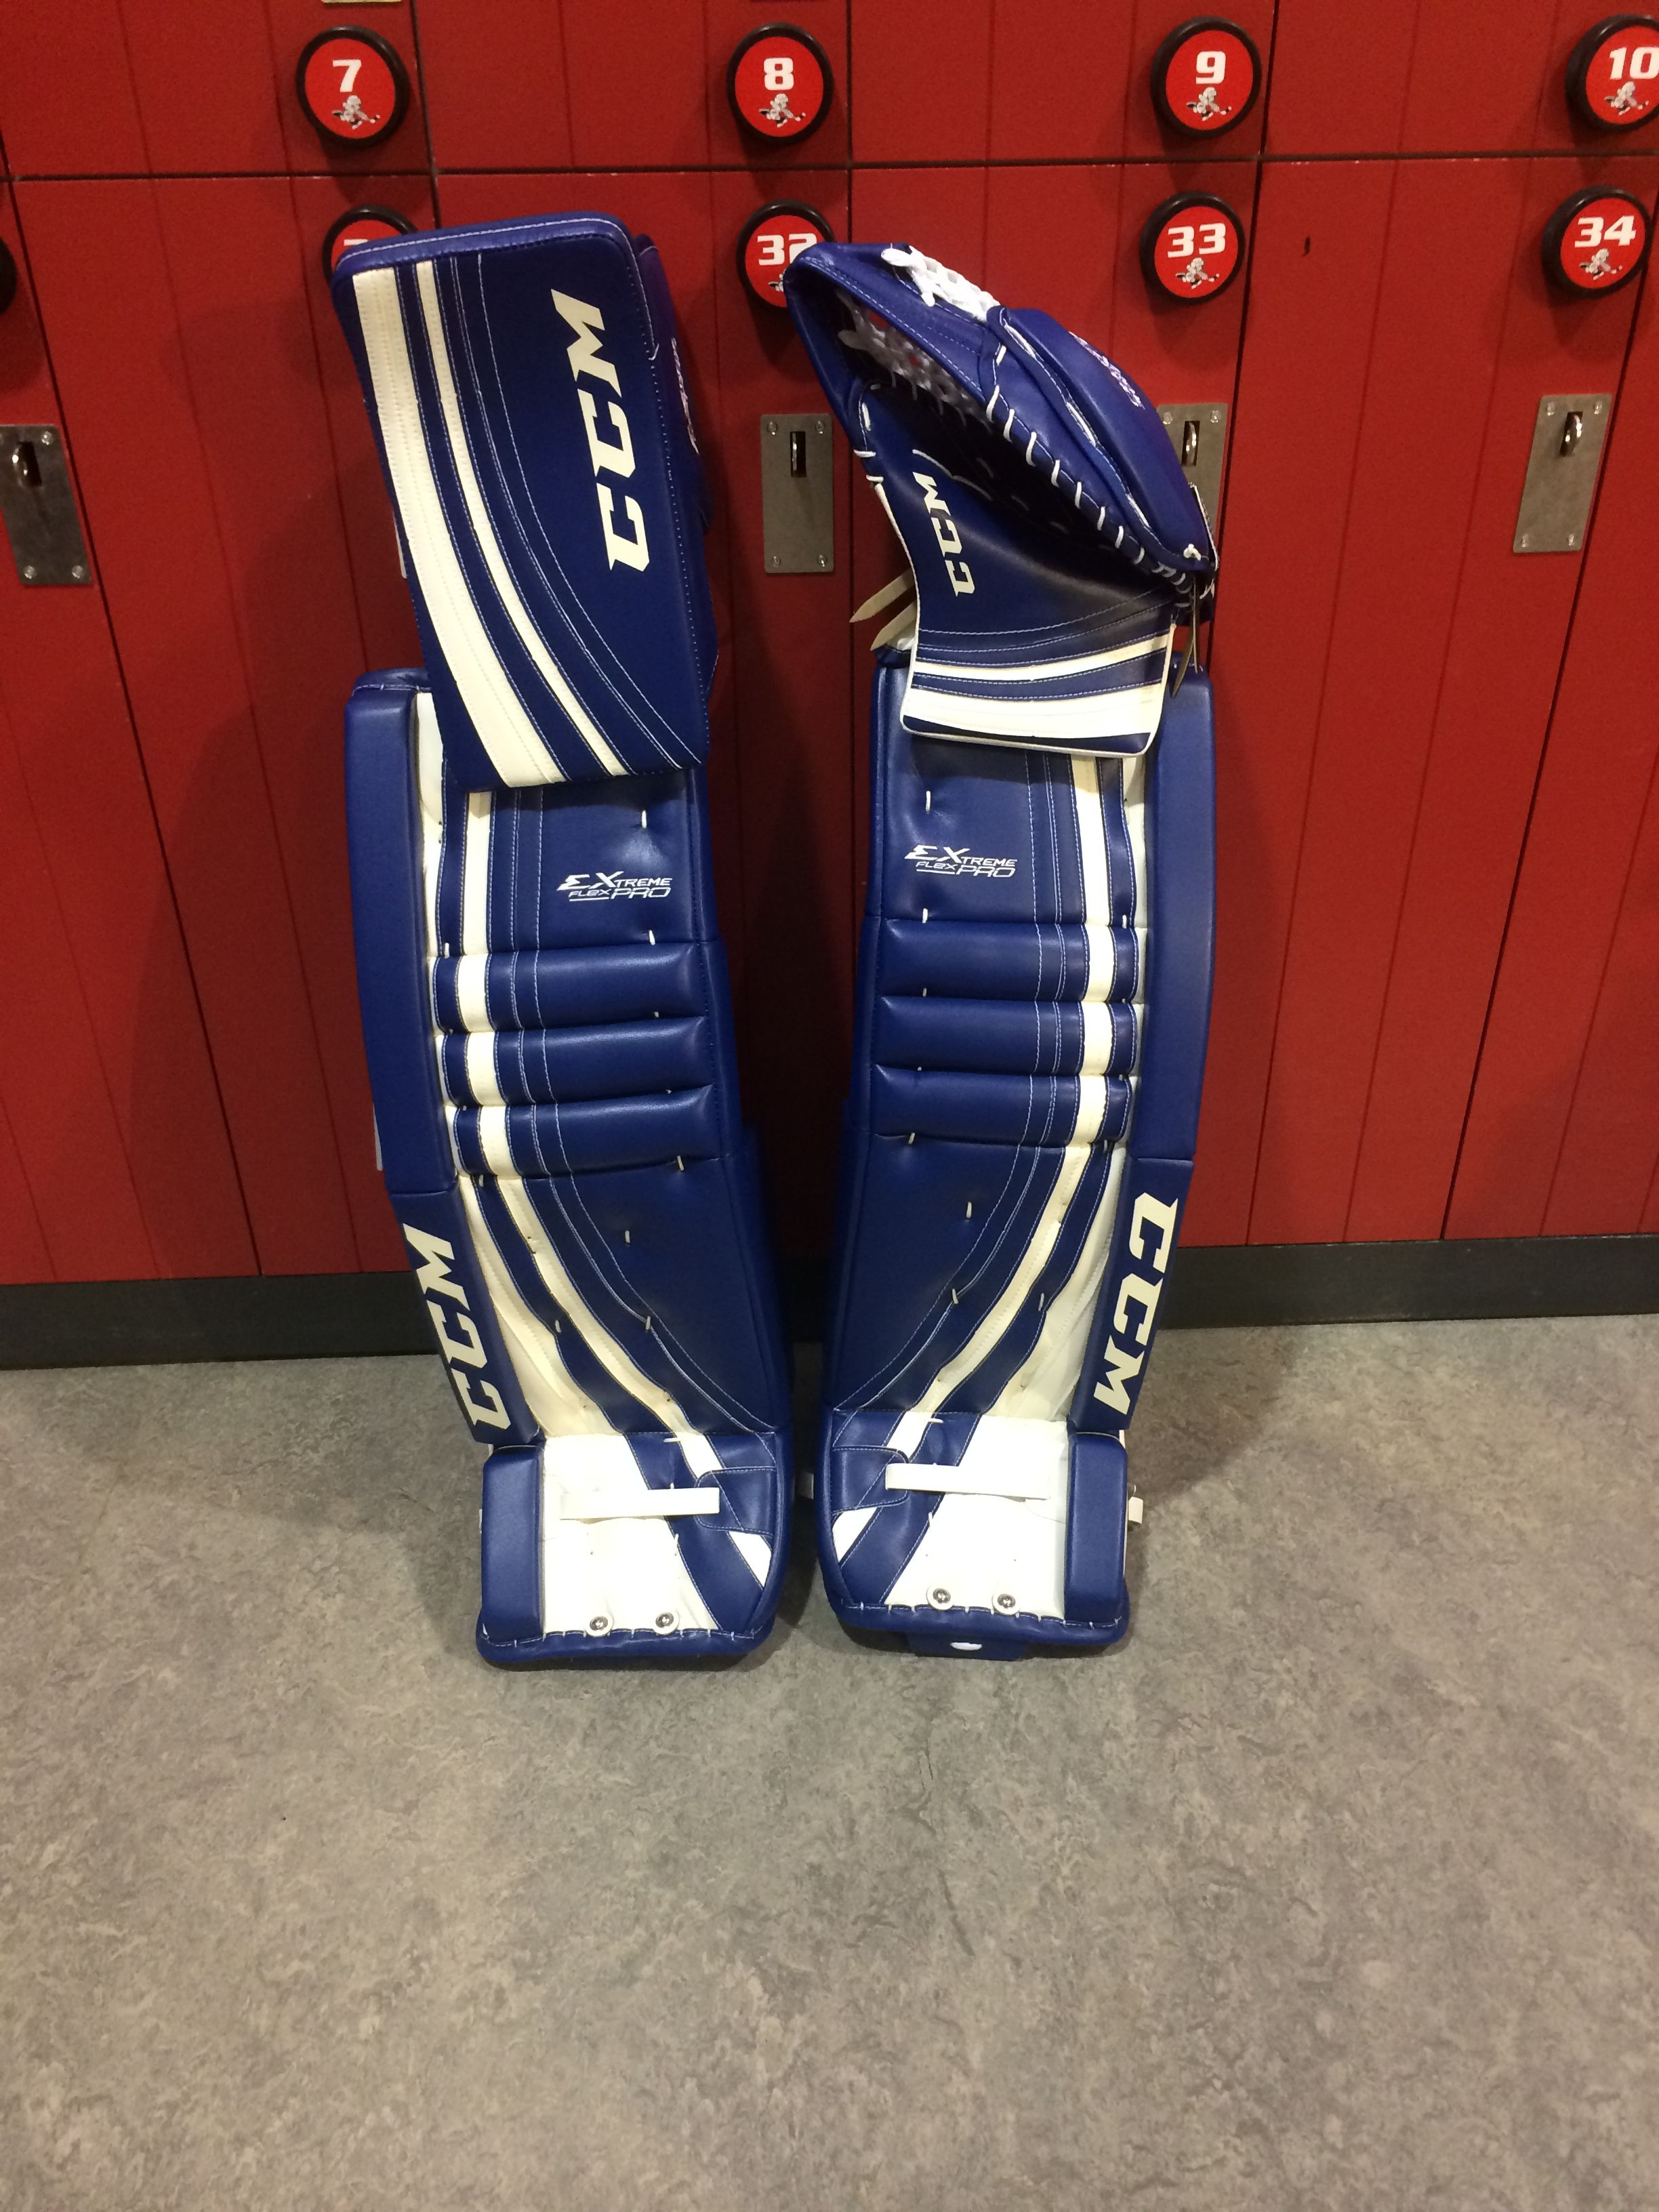 e3211dc6d95 CCM Extreme Flex Pro custom goalie pads and gloves made for a customer.